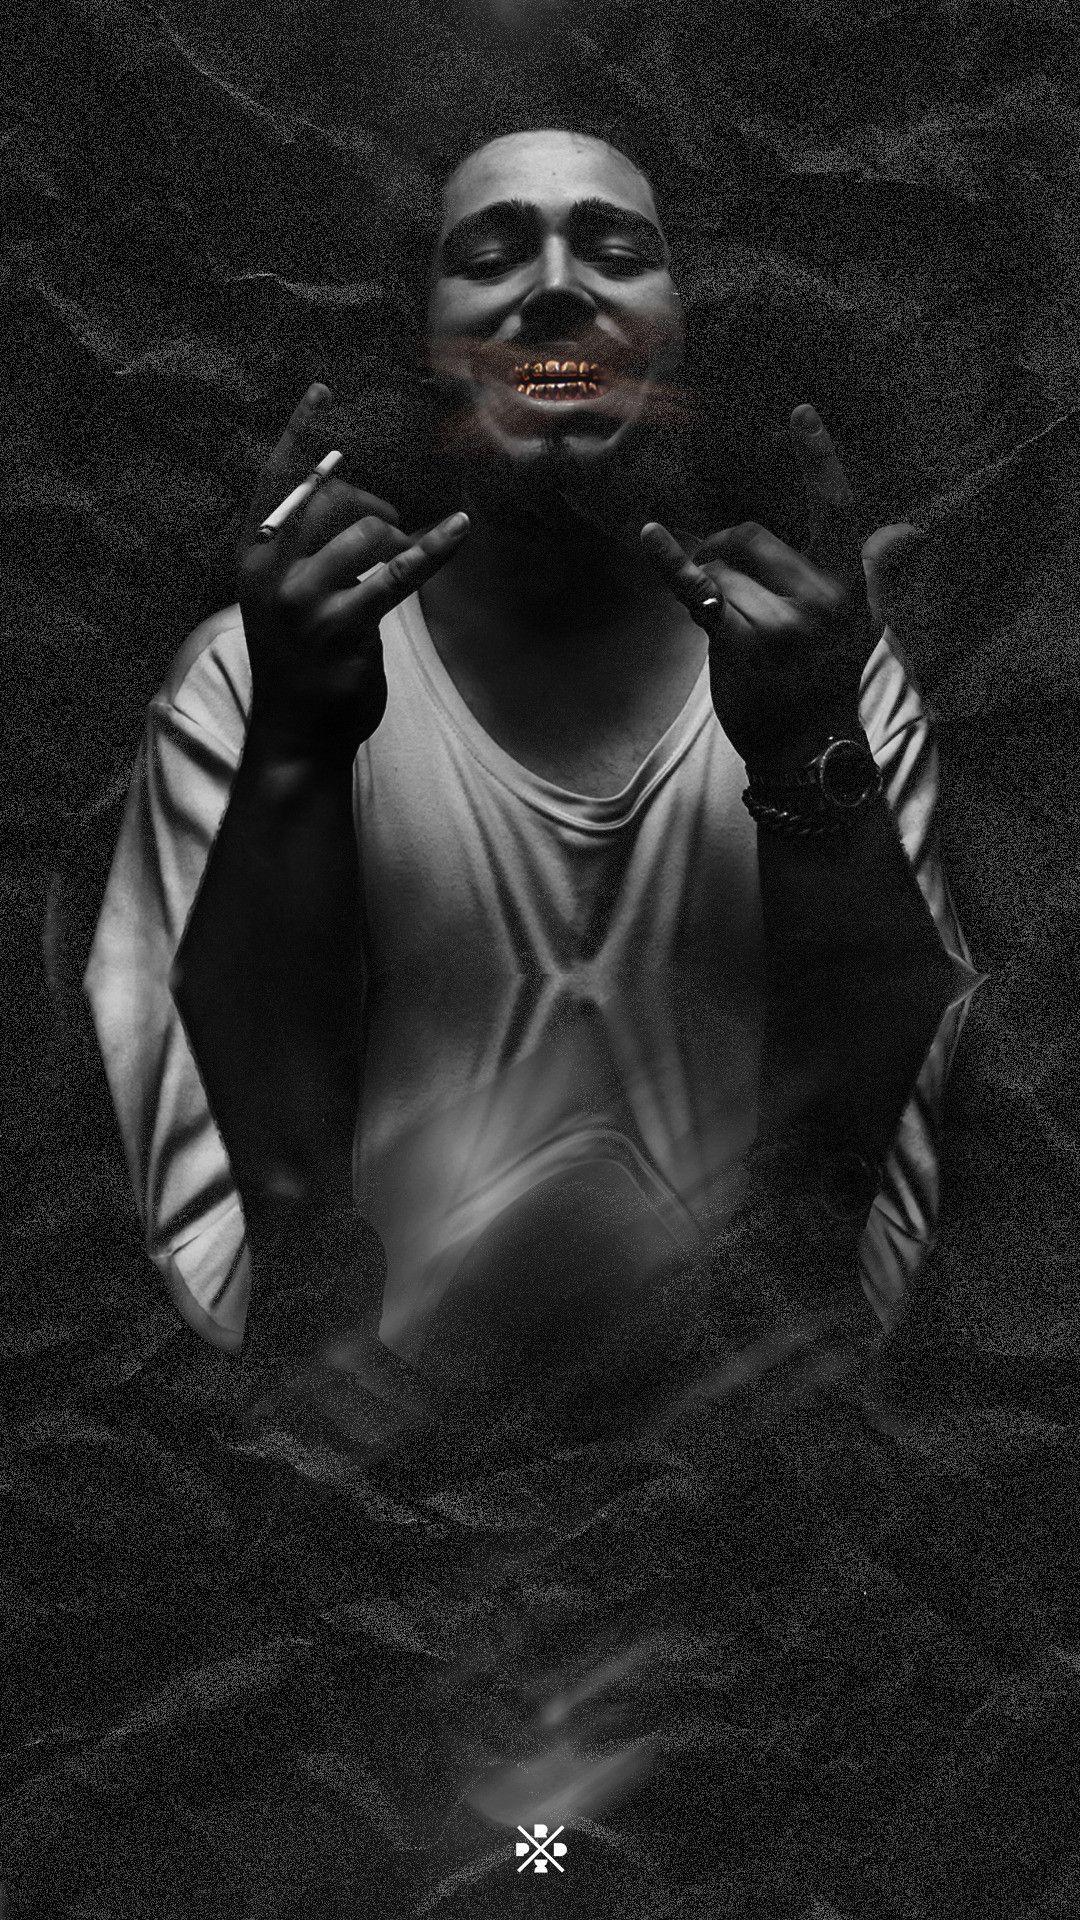 Aesthetic Justin Bieber Background Image Figure